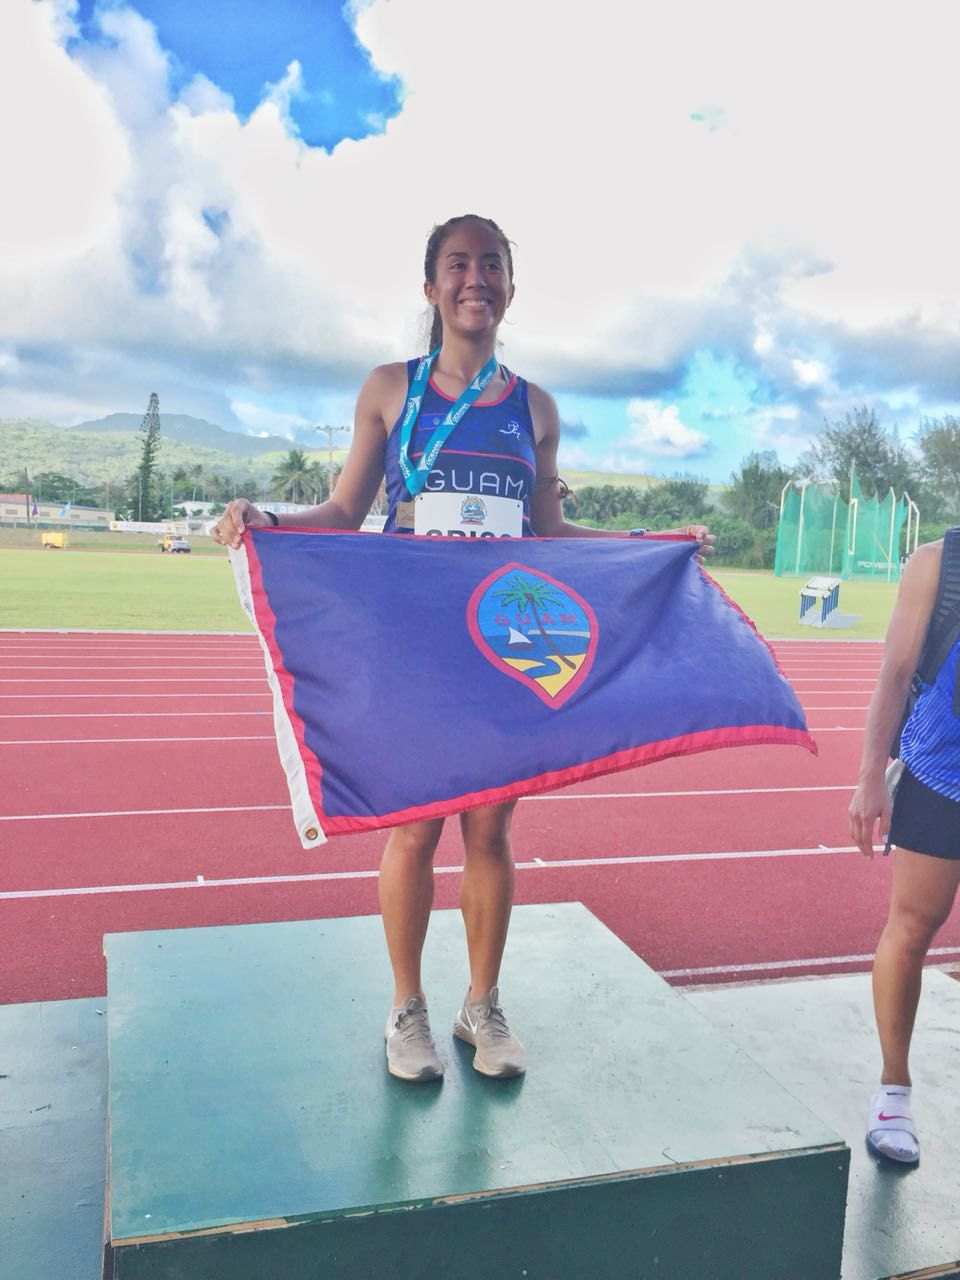 Team Guam makes mark at regionals